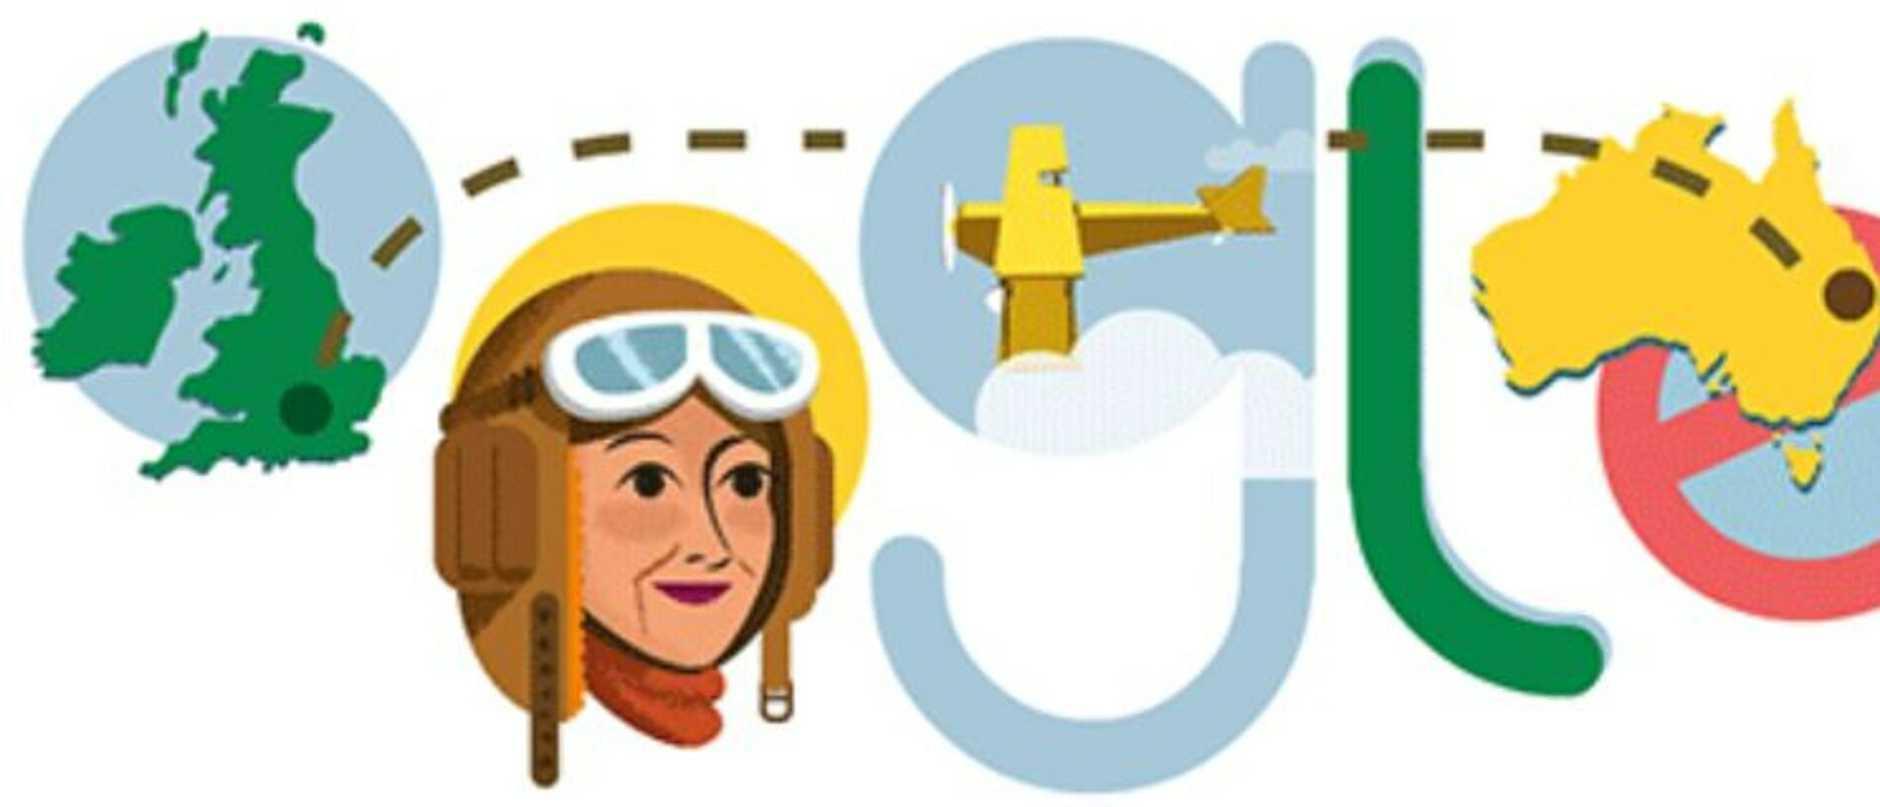 Google Doodle celebrates Maude 'Lores' Bonney's 122nd birthday.